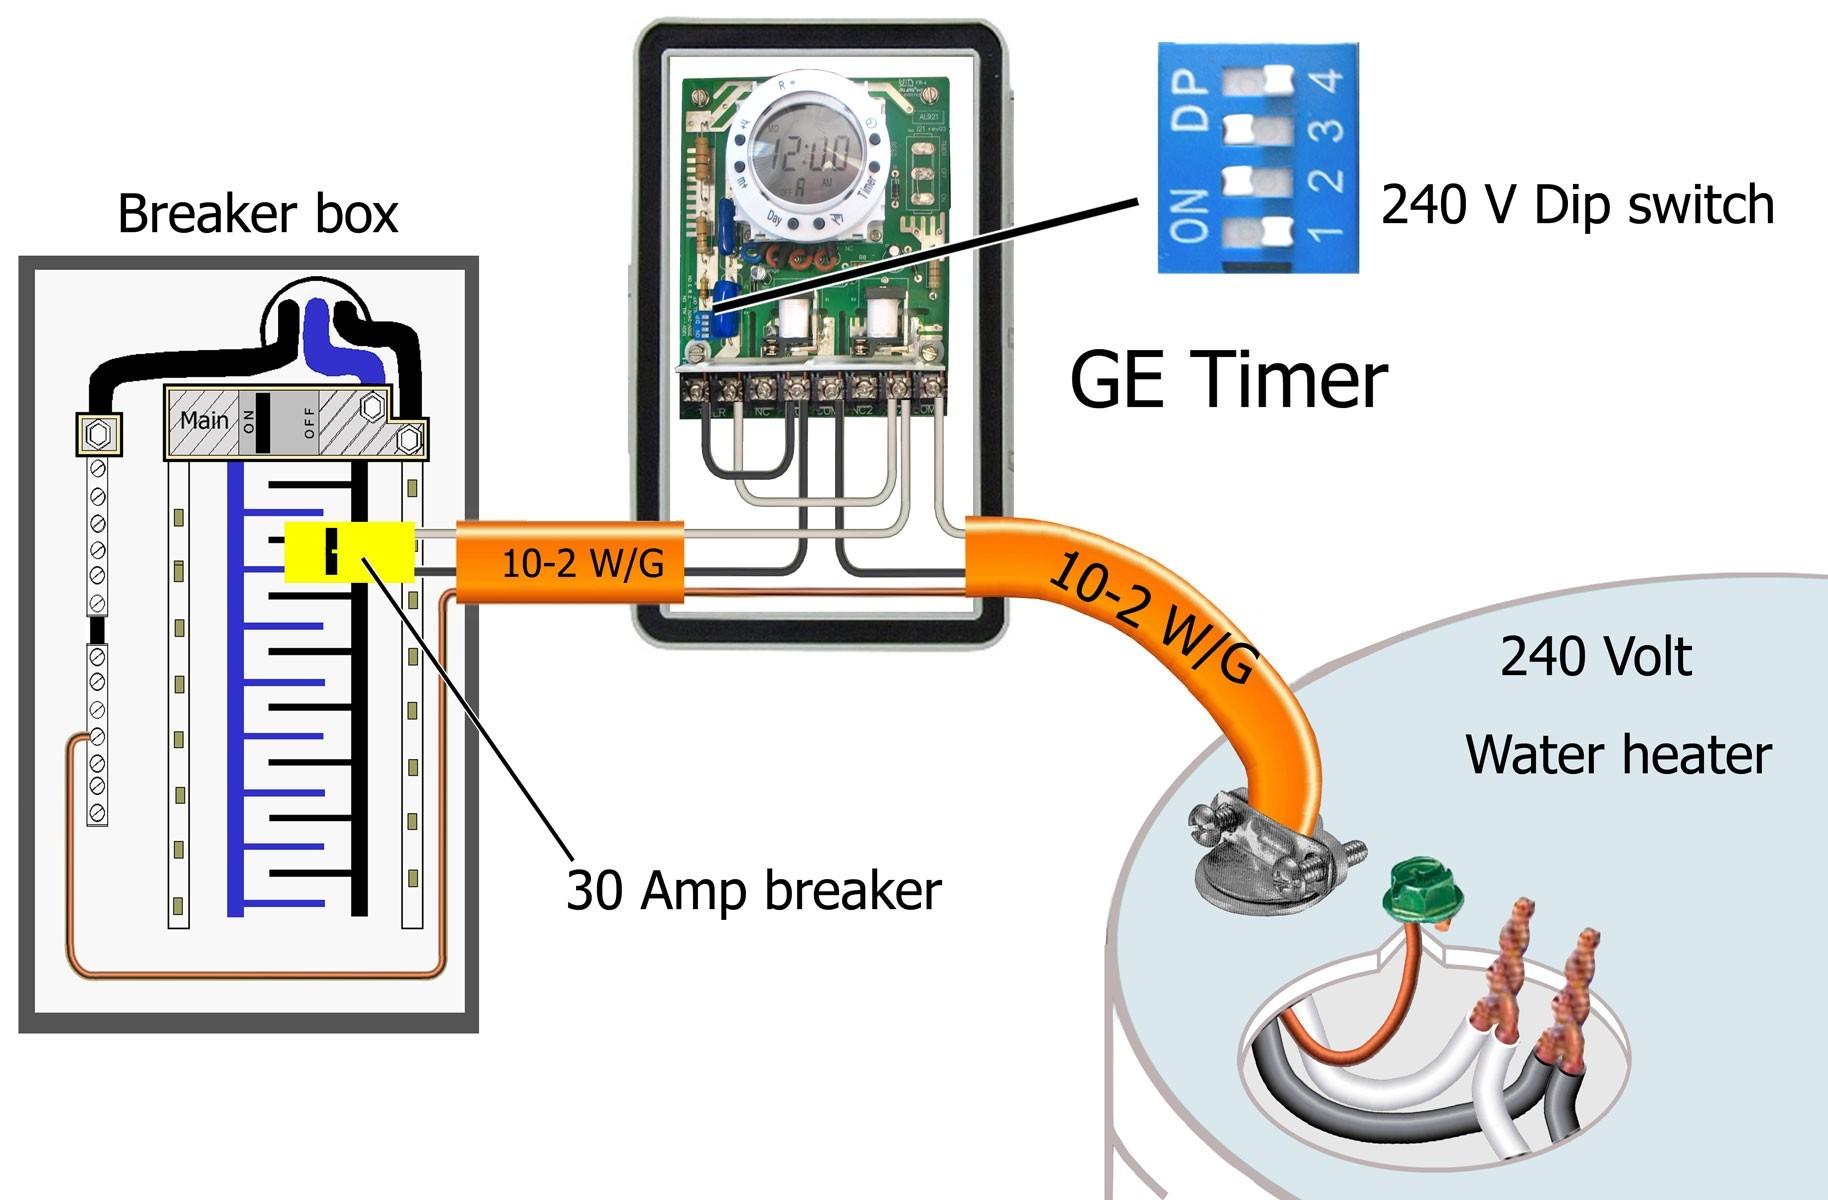 Wiring Diagram Electric Water Heater Best Wiring Diagram For Rheem Hot Water Heater Hbphelp